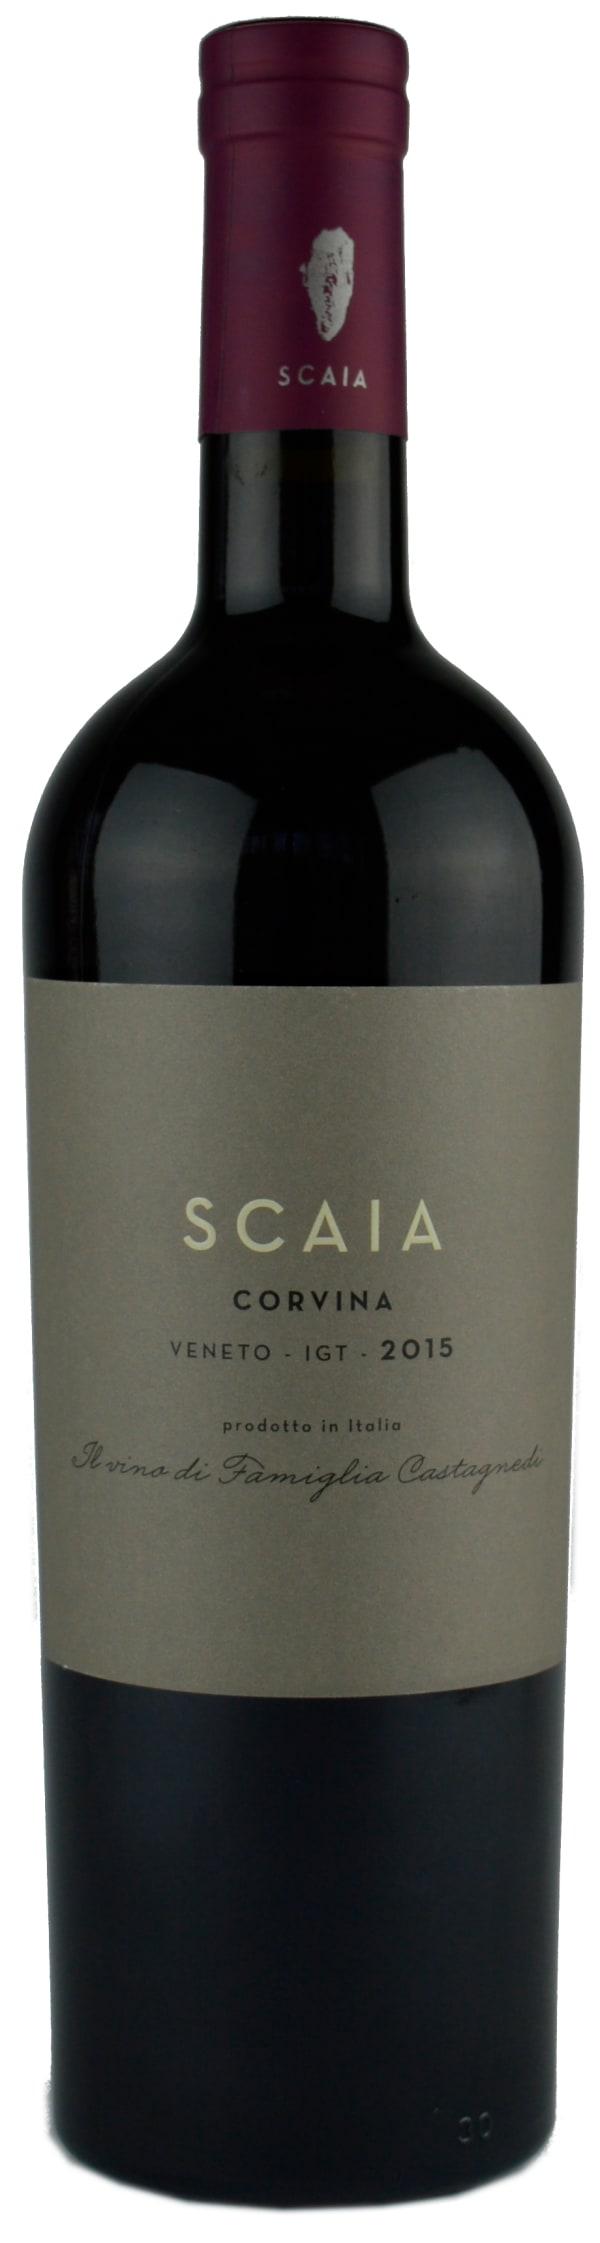 Scaia Corvina 2016